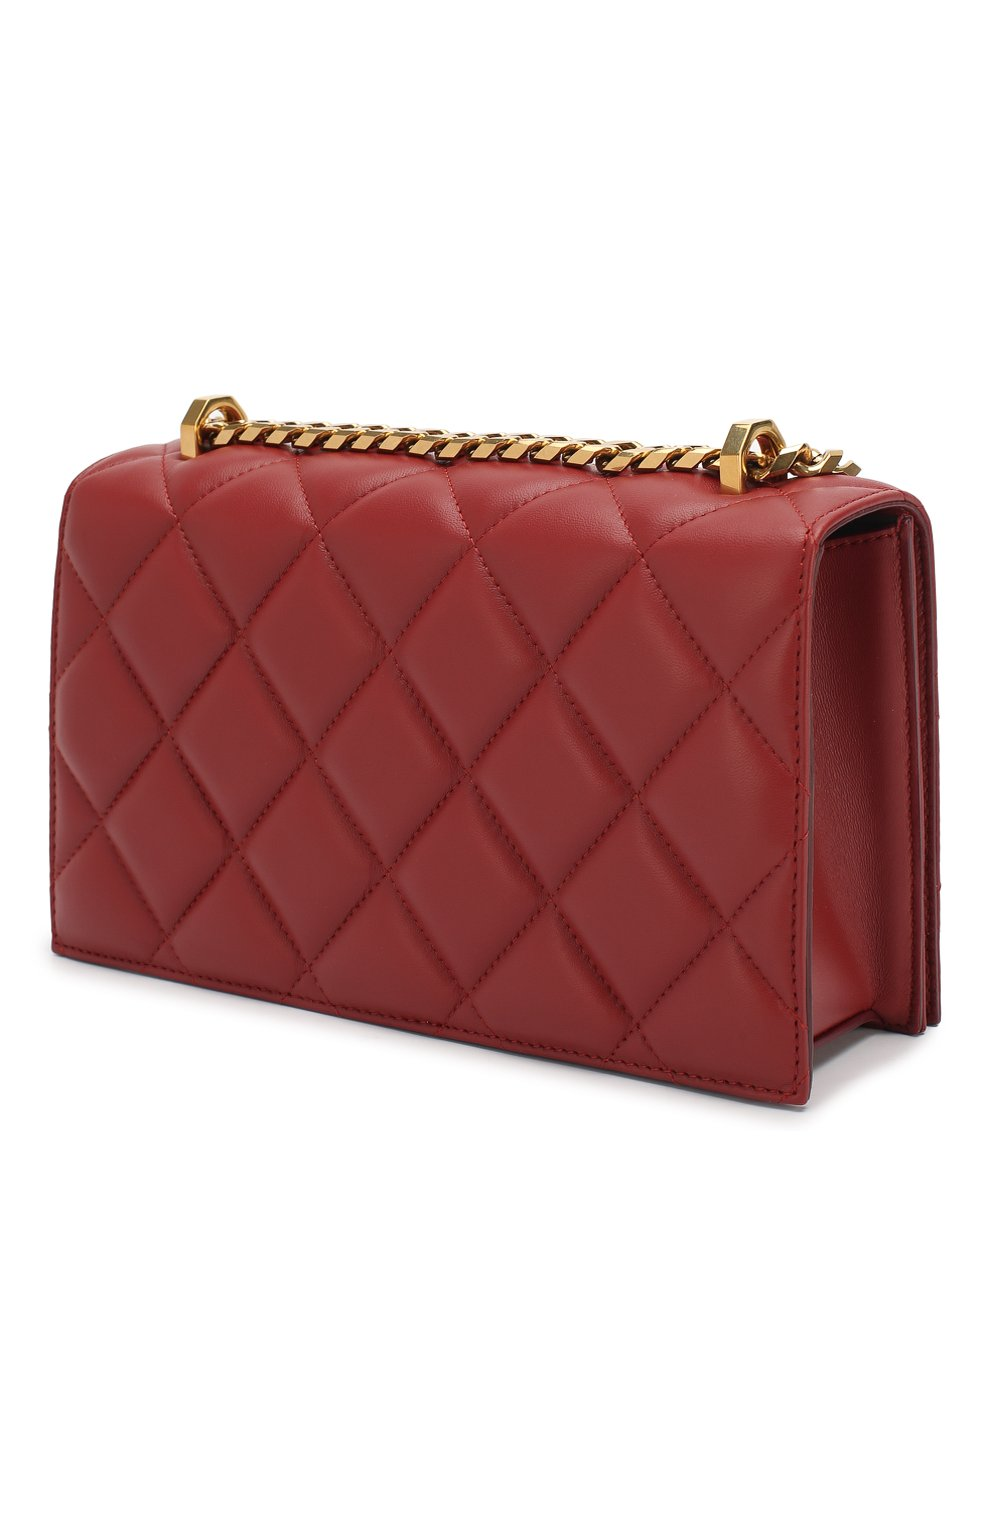 Сумка Jewelled Satchel Alexander McQueen красная цвета   Фото №3